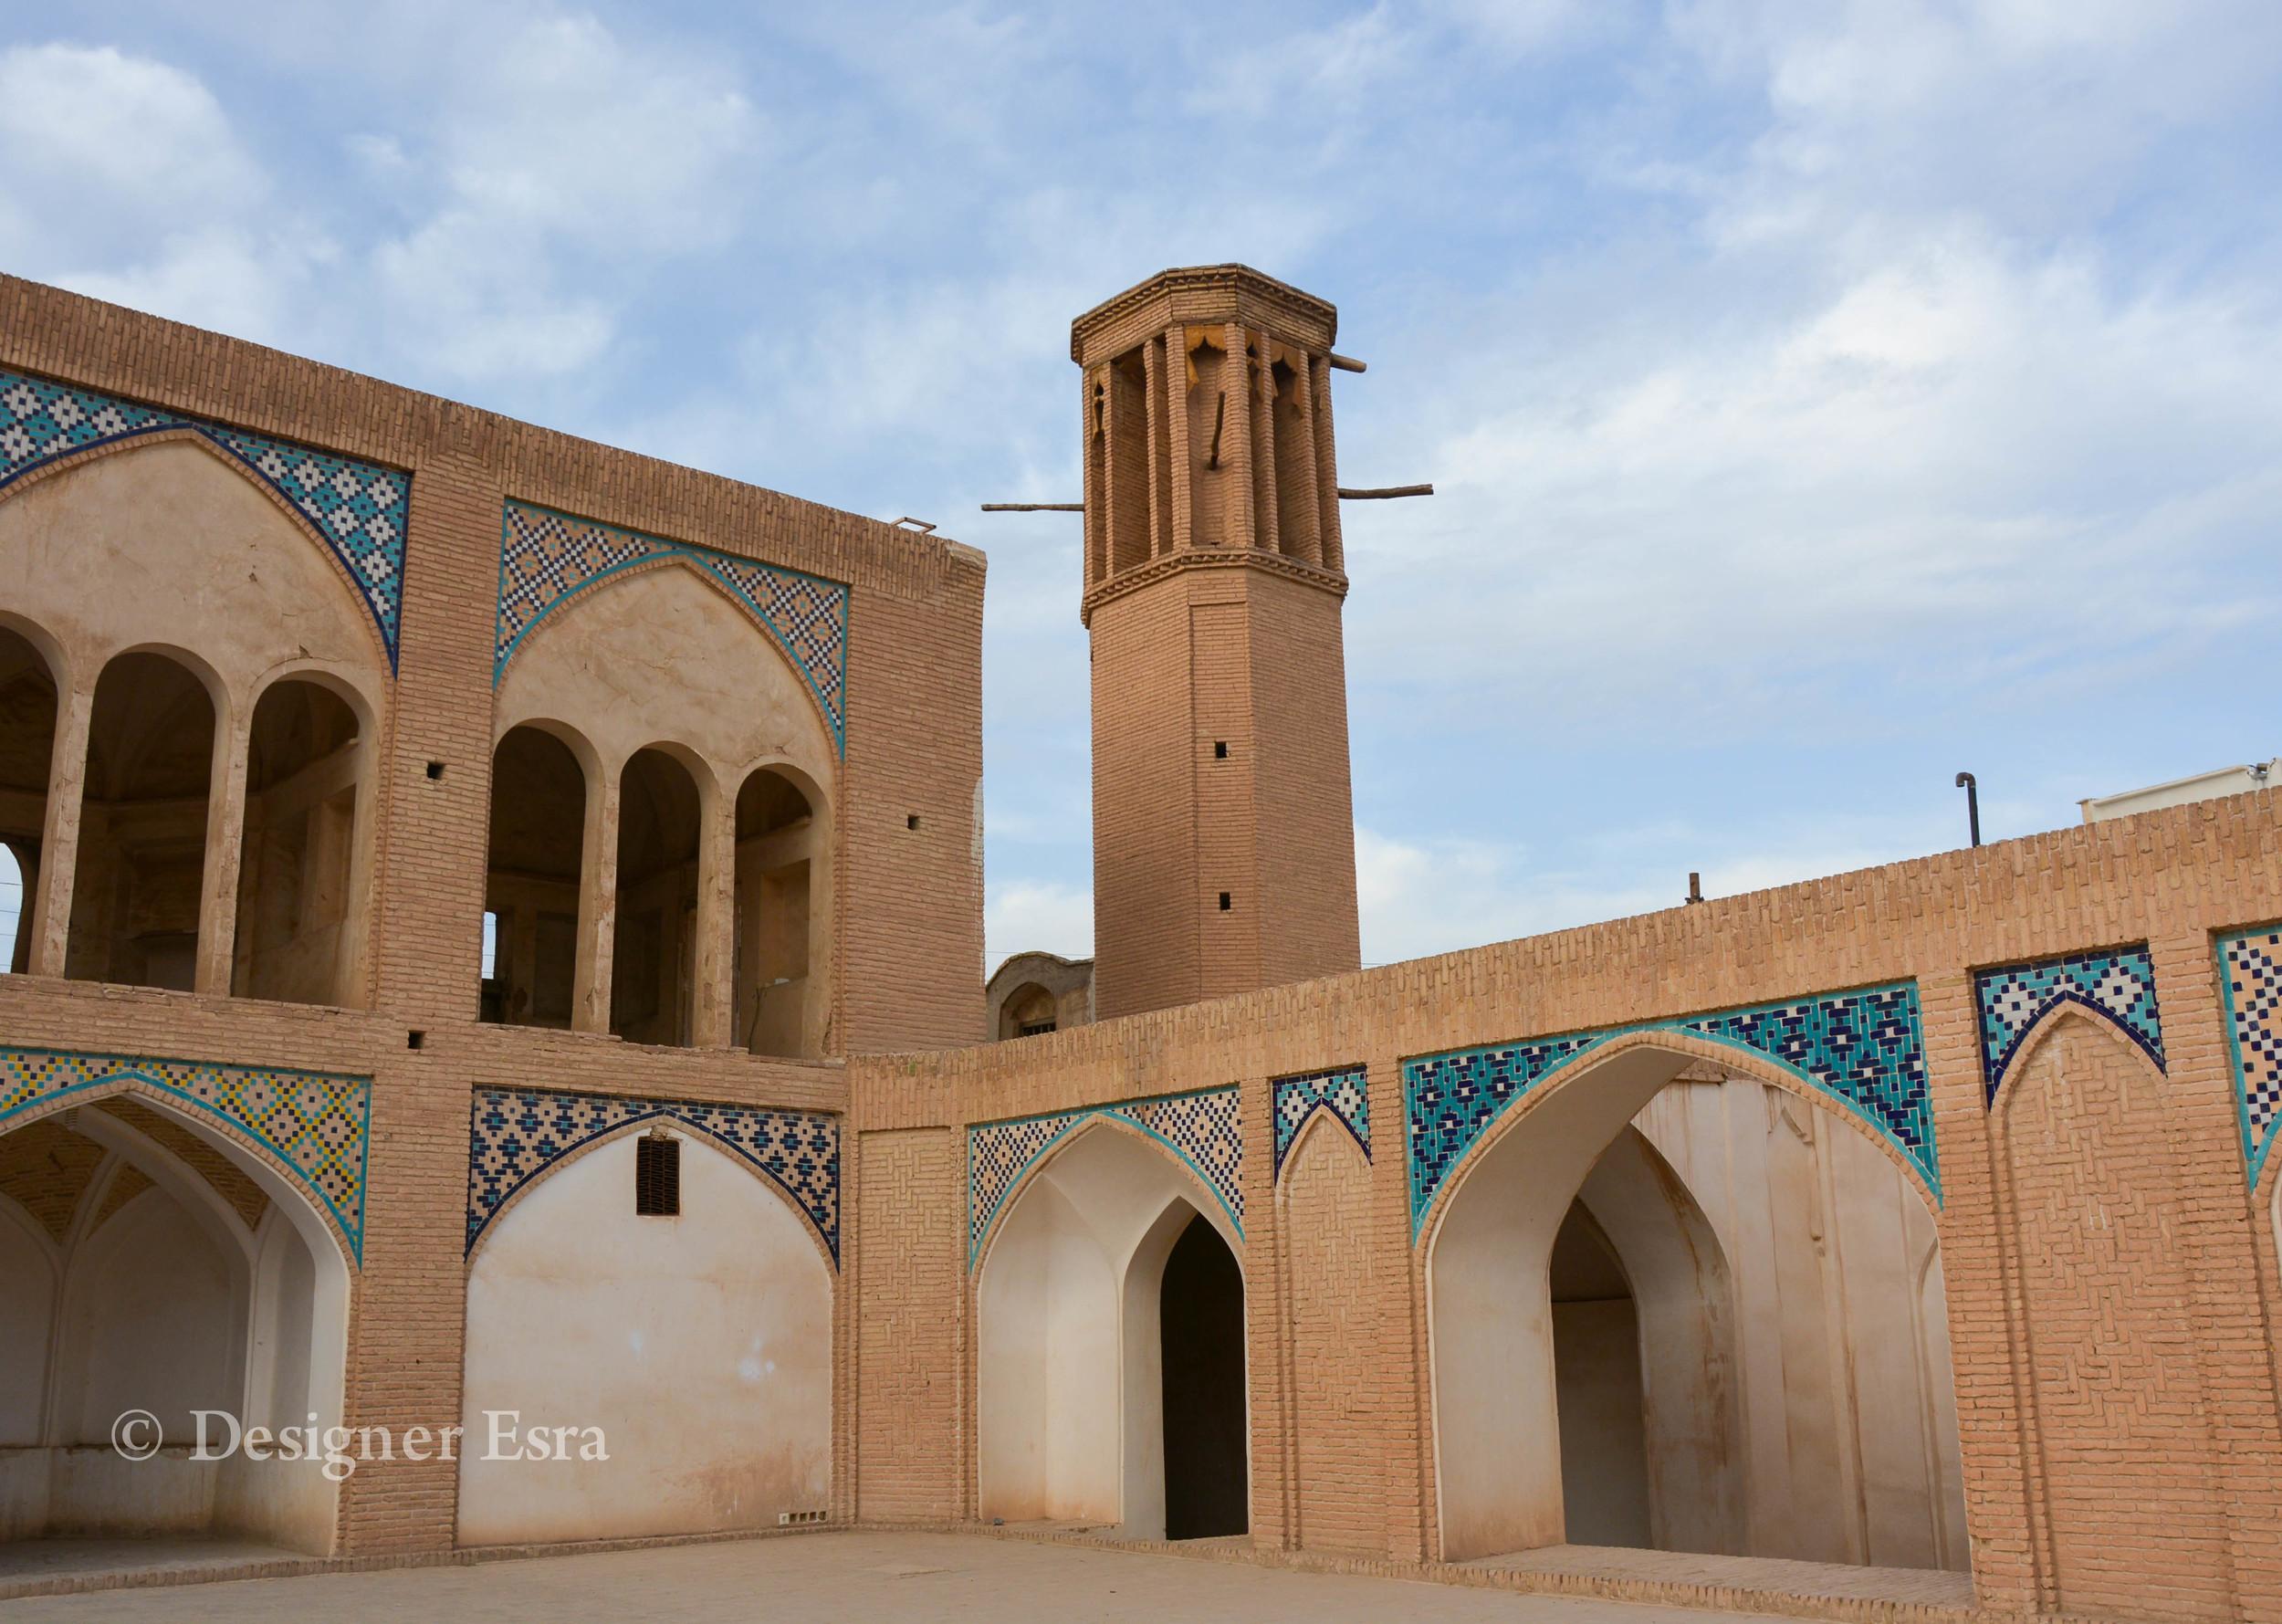 Windcatcher in Agha Bozorg Mosque in Kashan, Iran